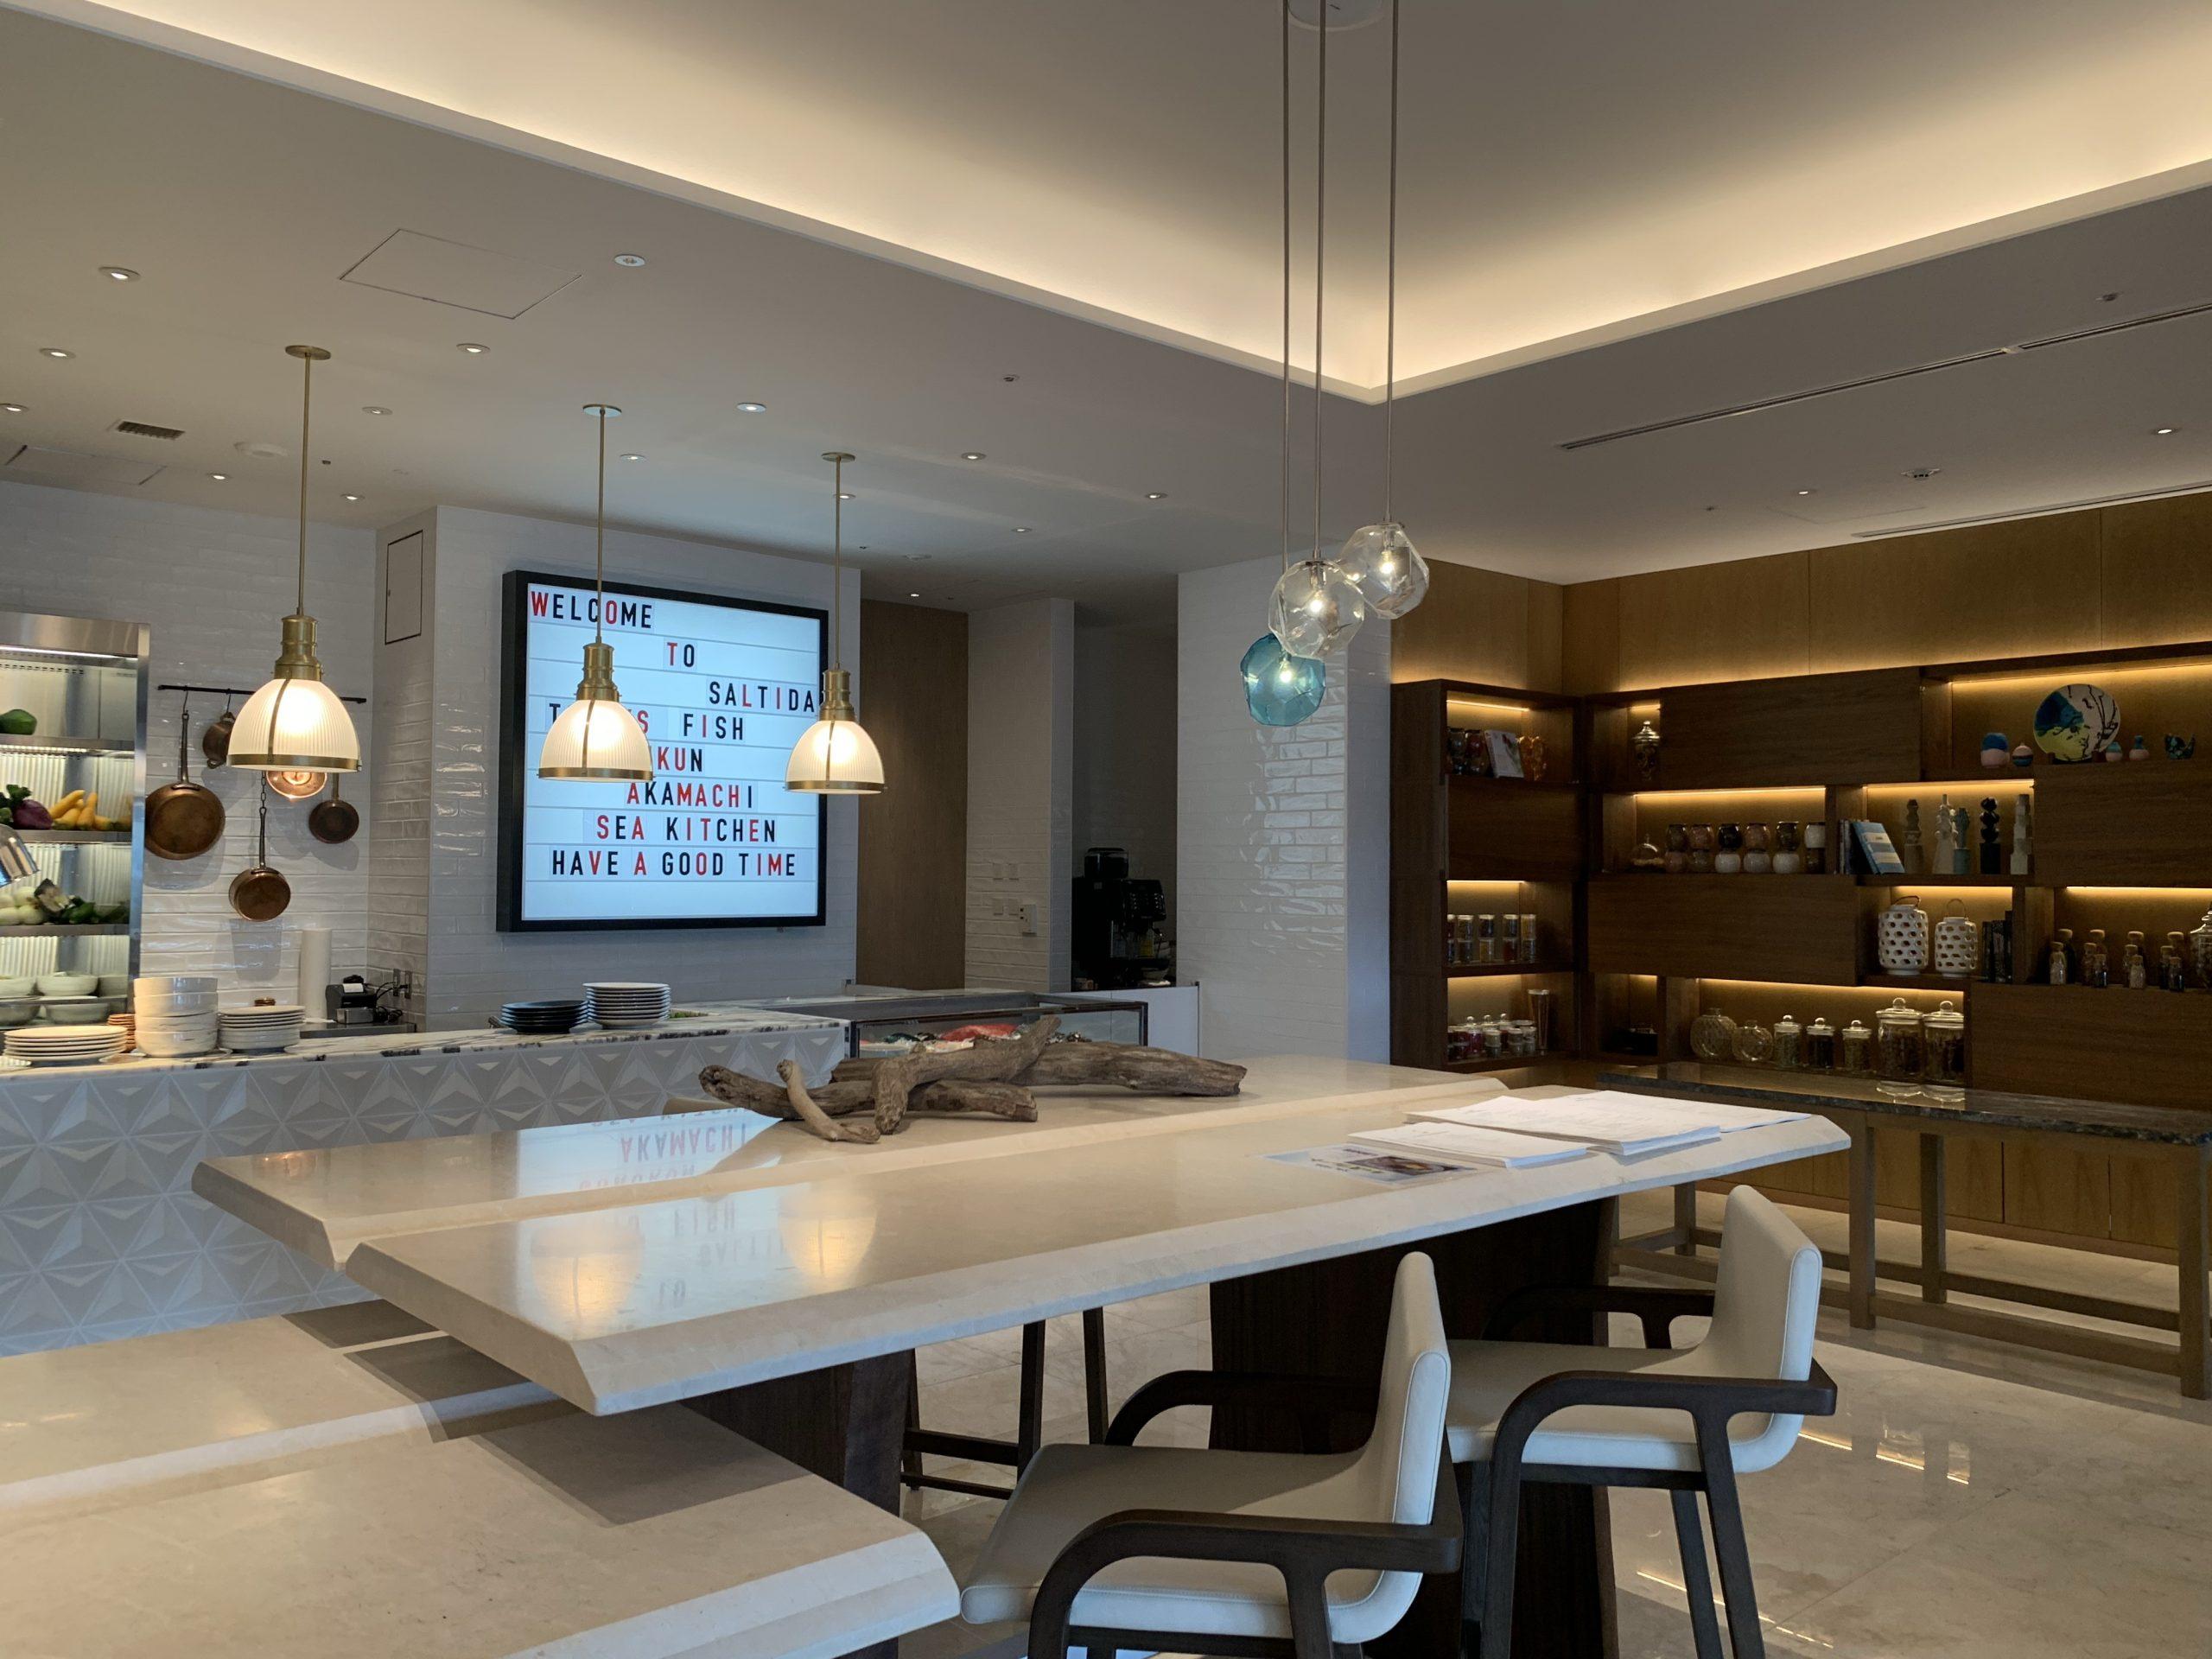 SALTIDAオープンキッチン